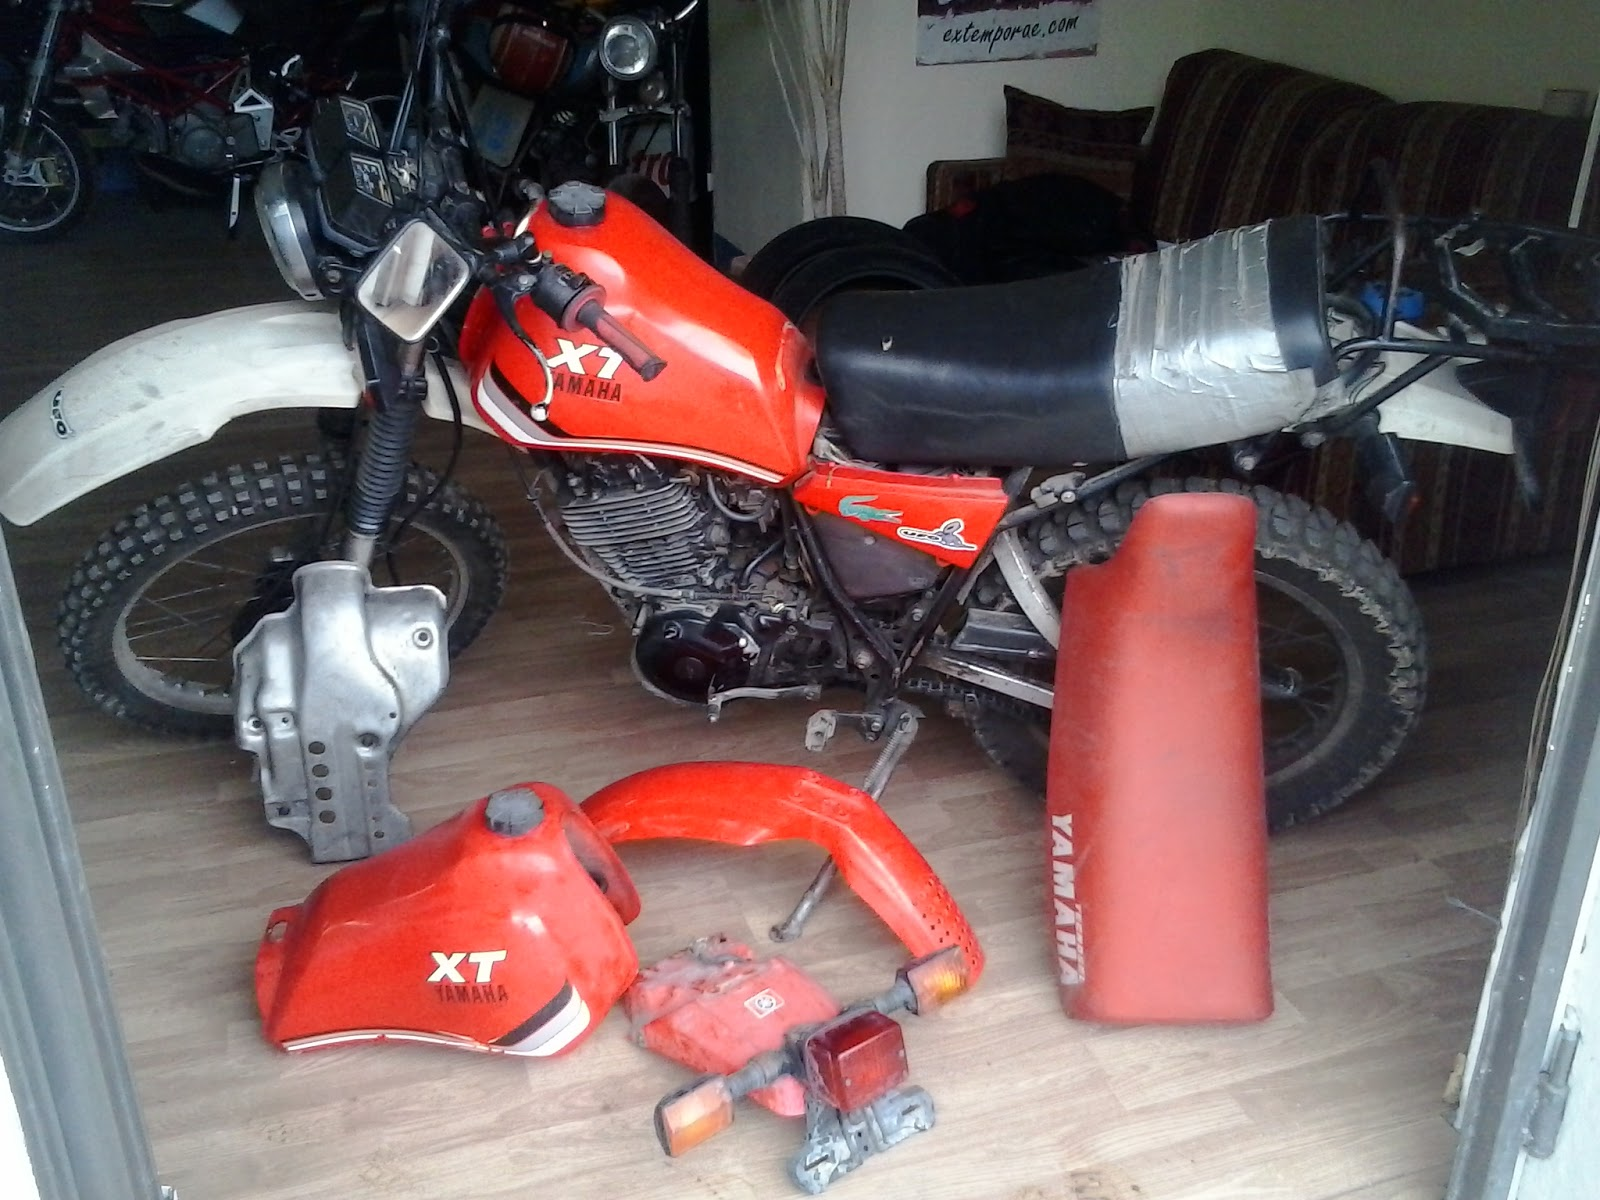 Motoricambi-usati: Ricambi yamaha xt 550